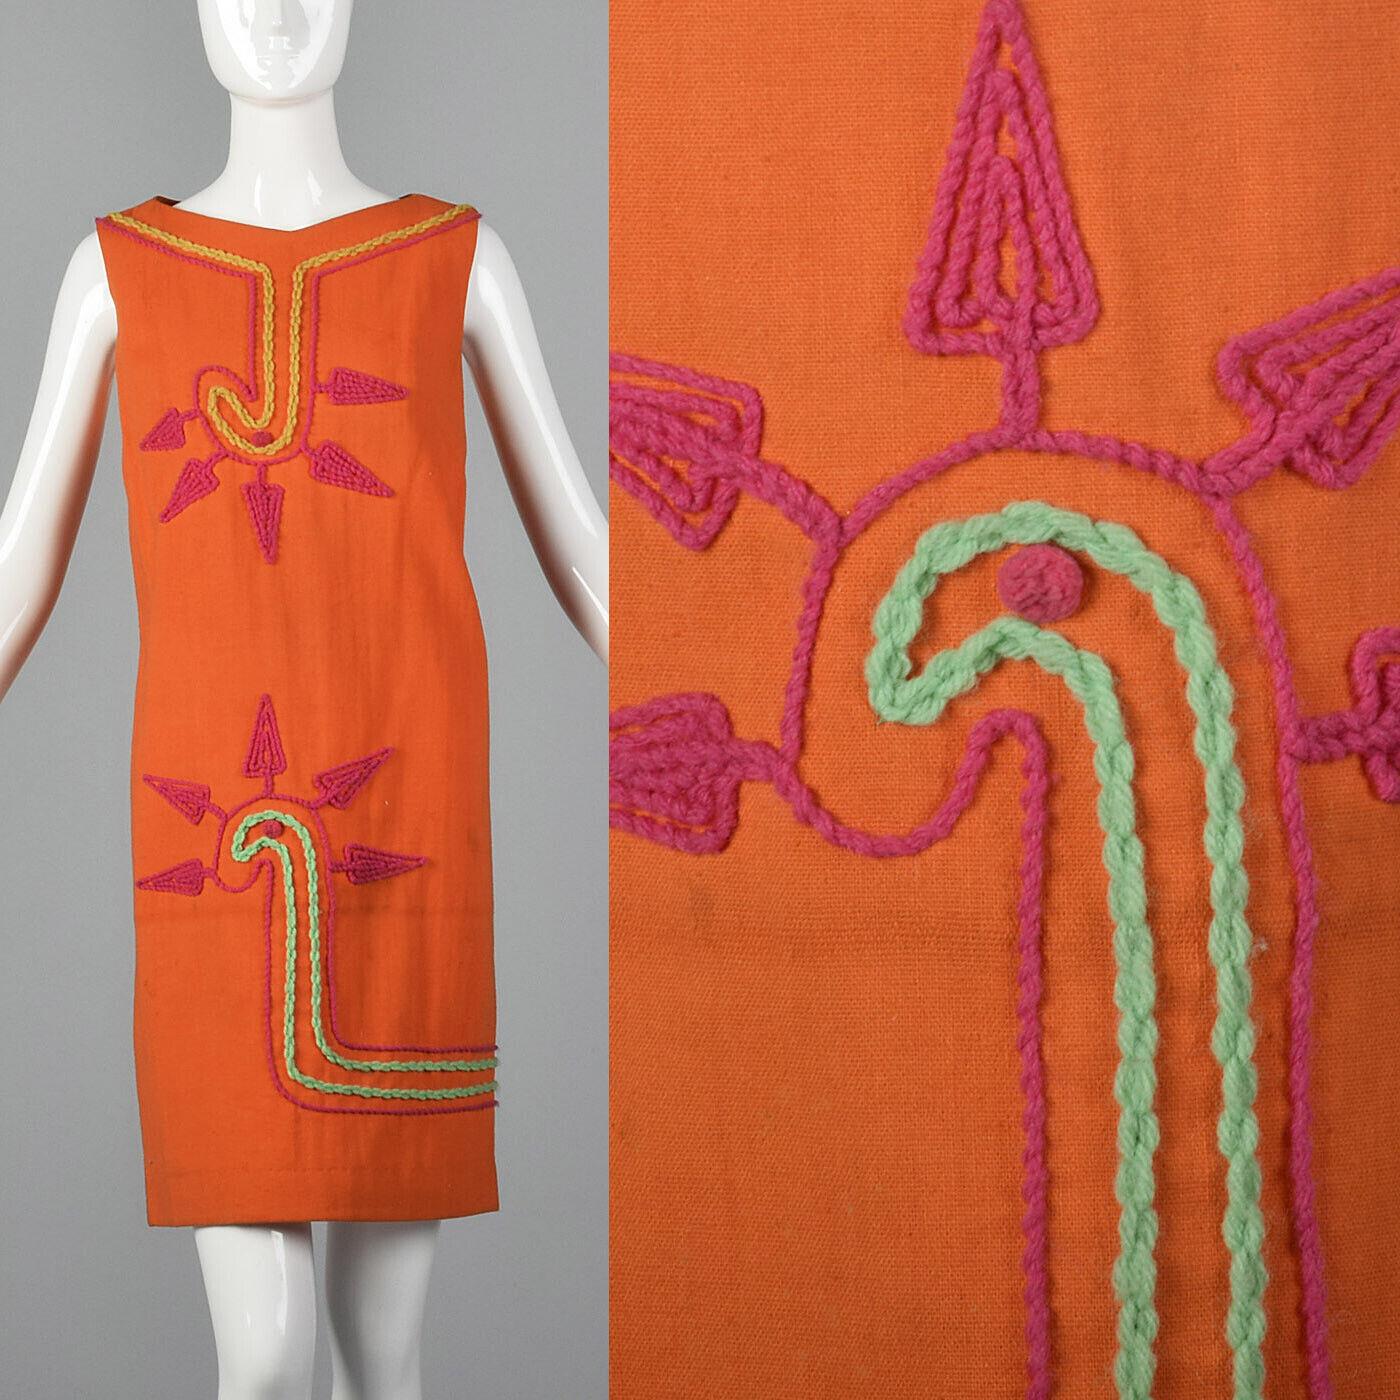 M 1960s Orange Sleeveless Shift Dress Yarn Applique Casual Spring Summer 60s